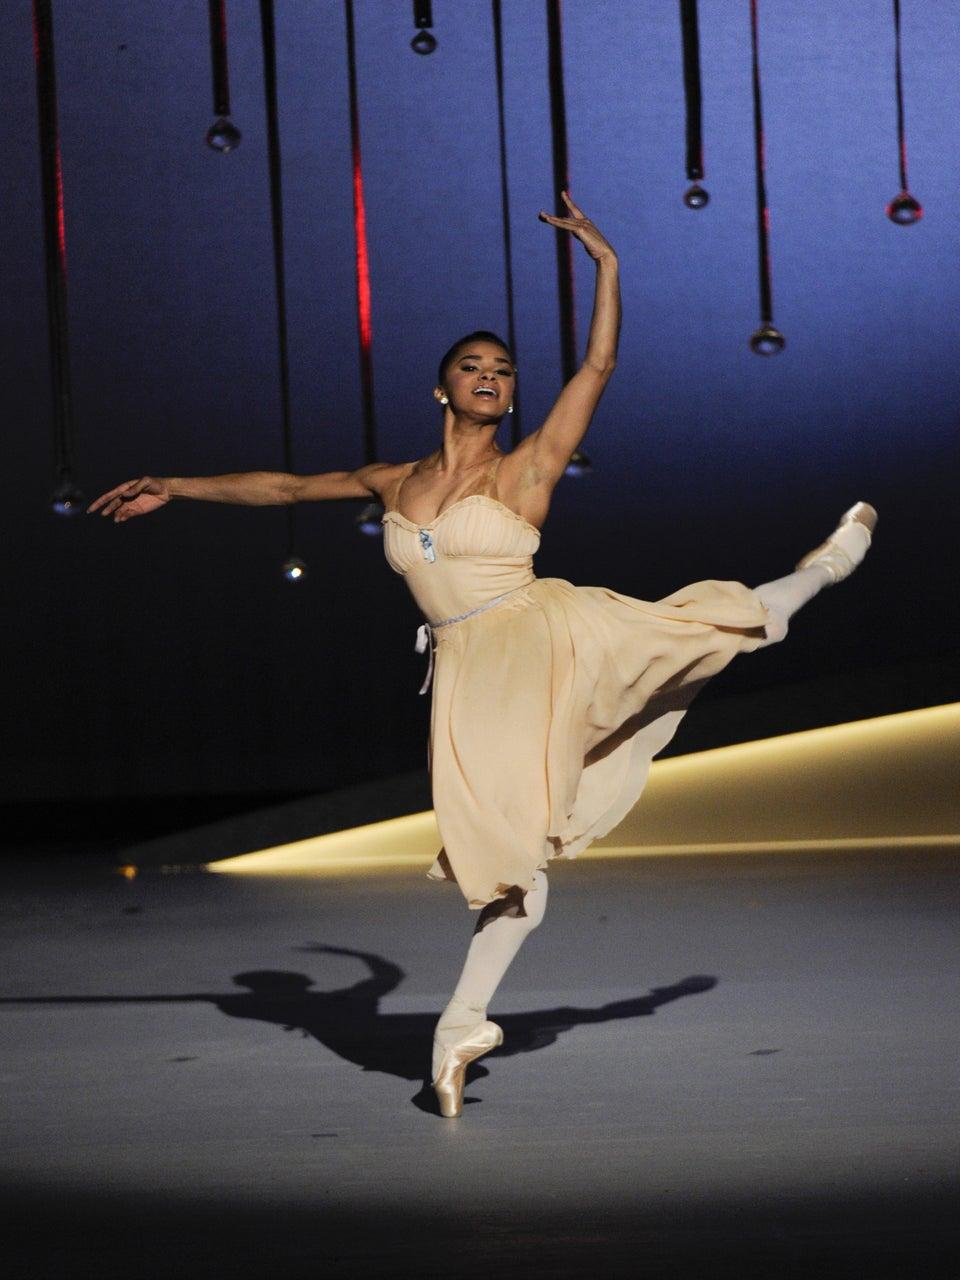 #BlackGirlMagic! Misty Copeland Becomes First Black Principal Ballerina at American Ballet Theater